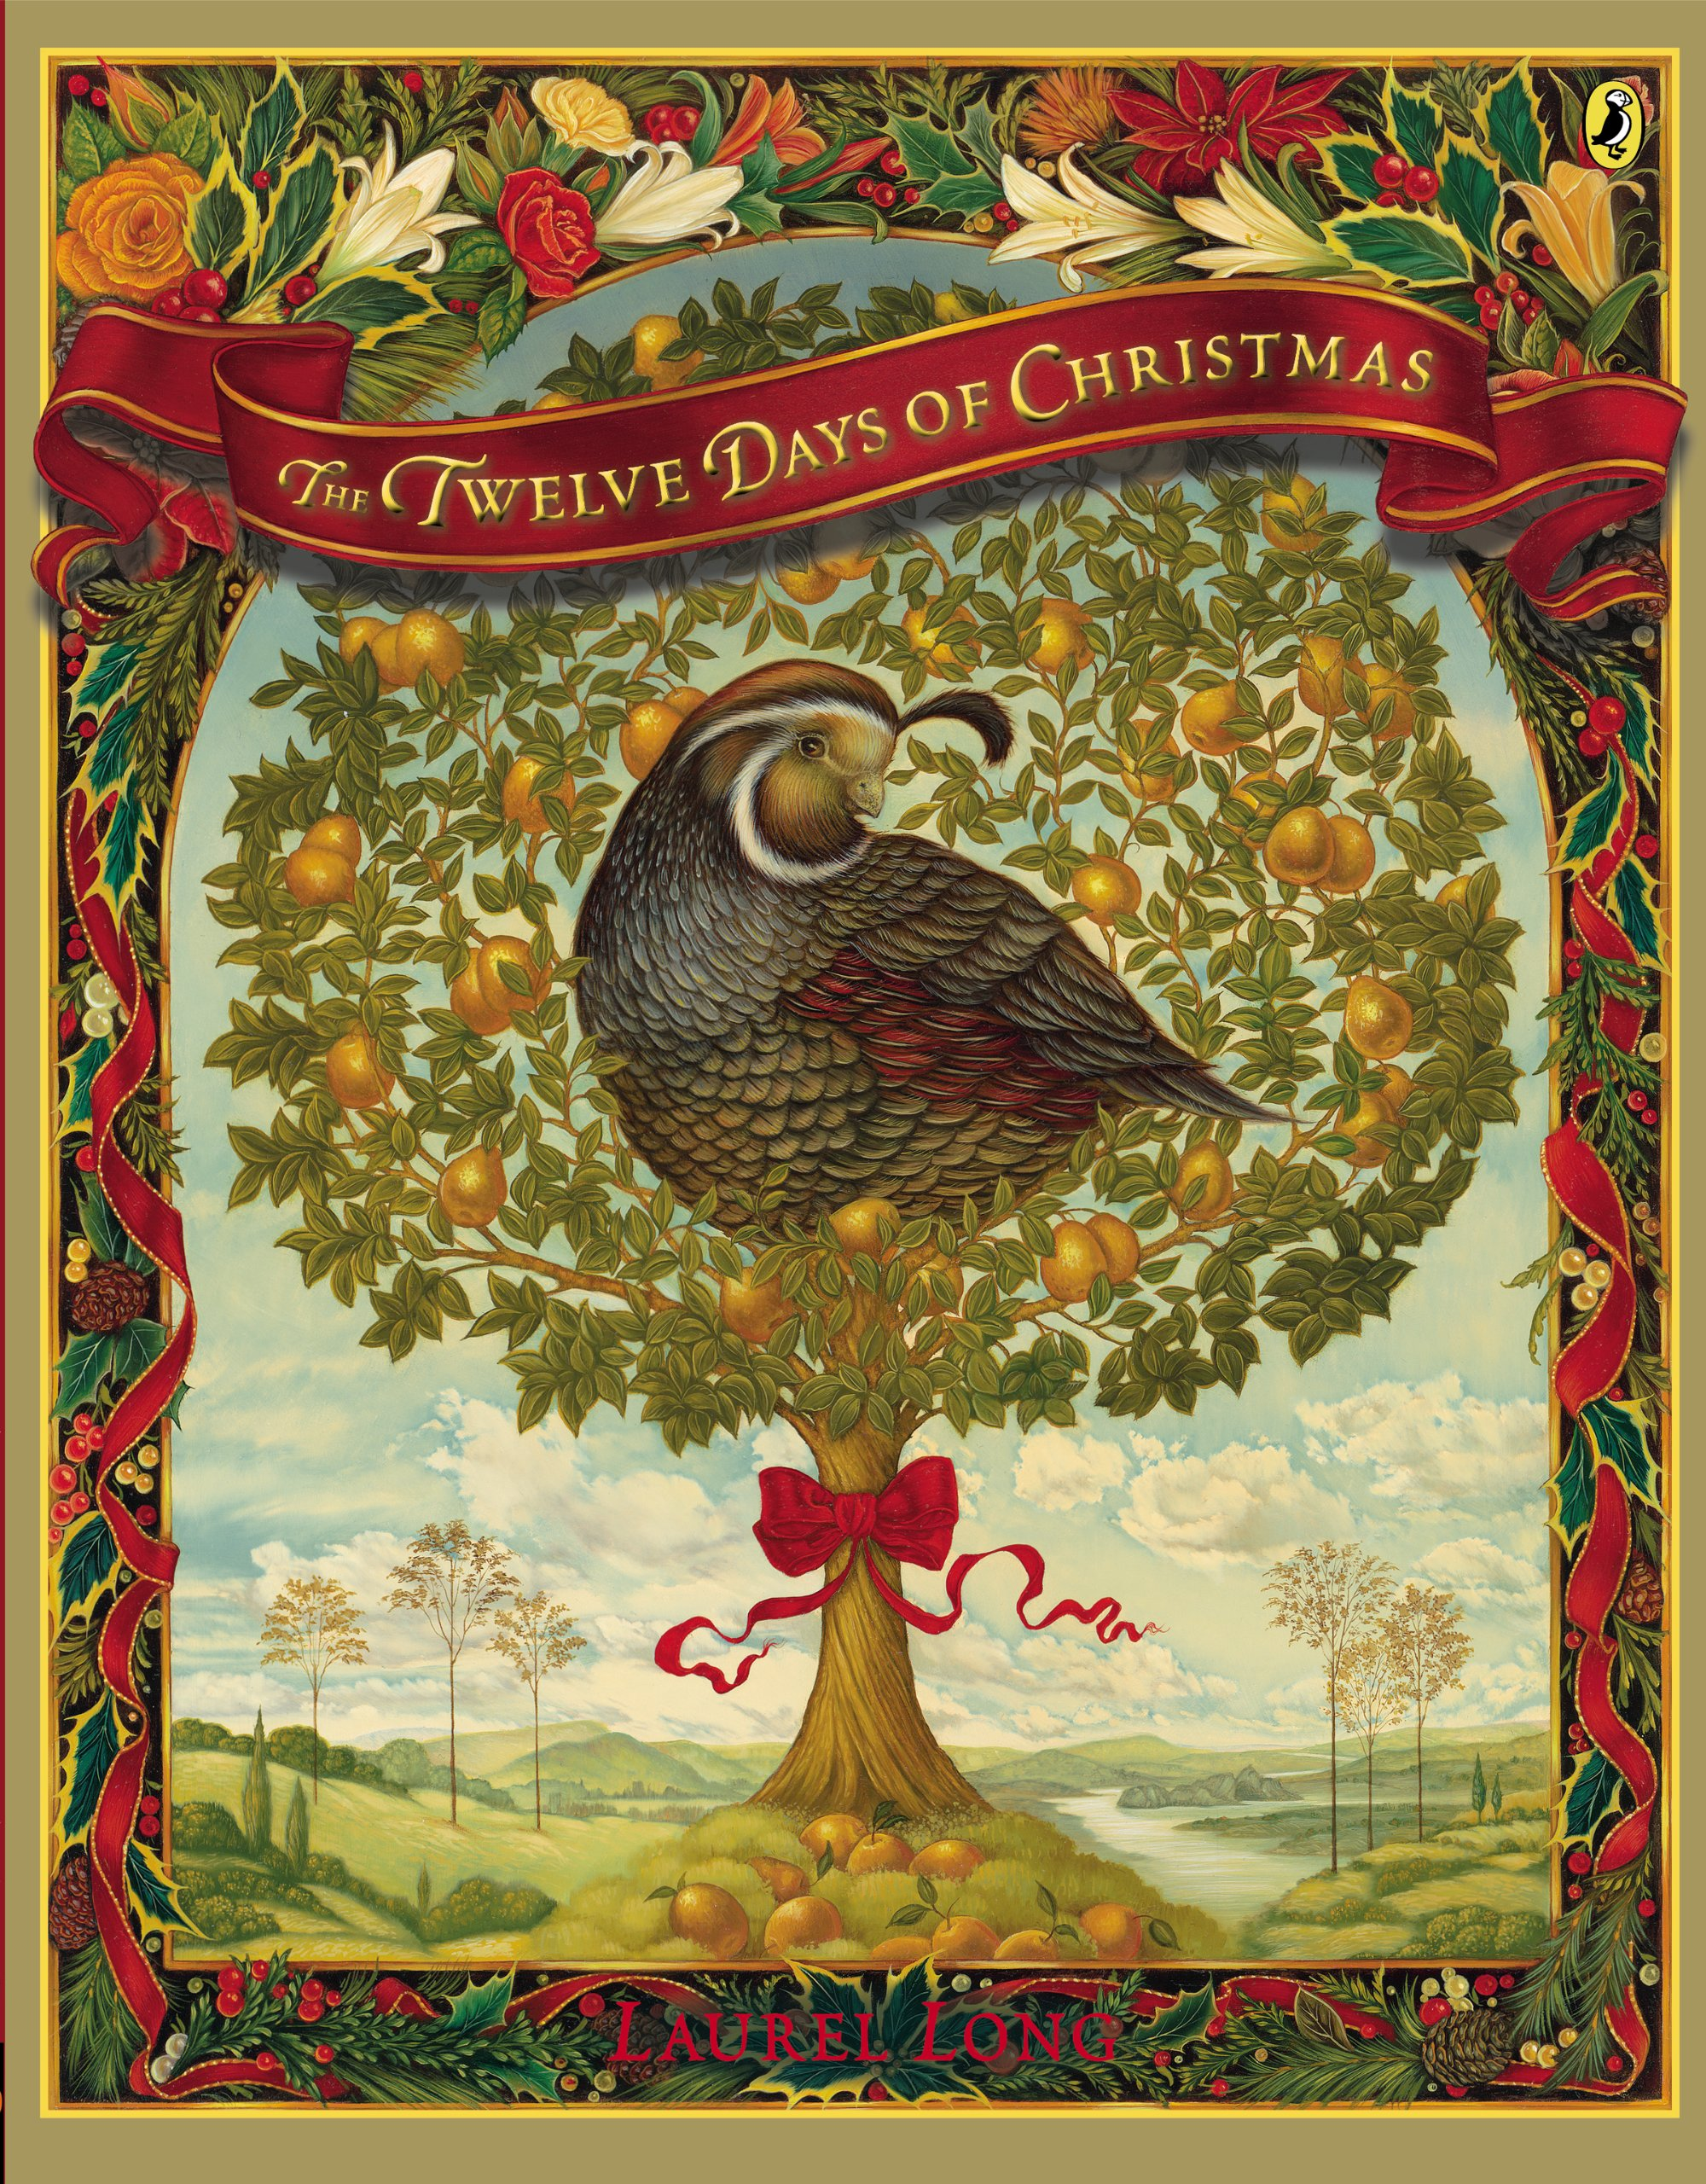 Amazon.com: The Twelve Days of Christmas (9780803733572): Laurel ...